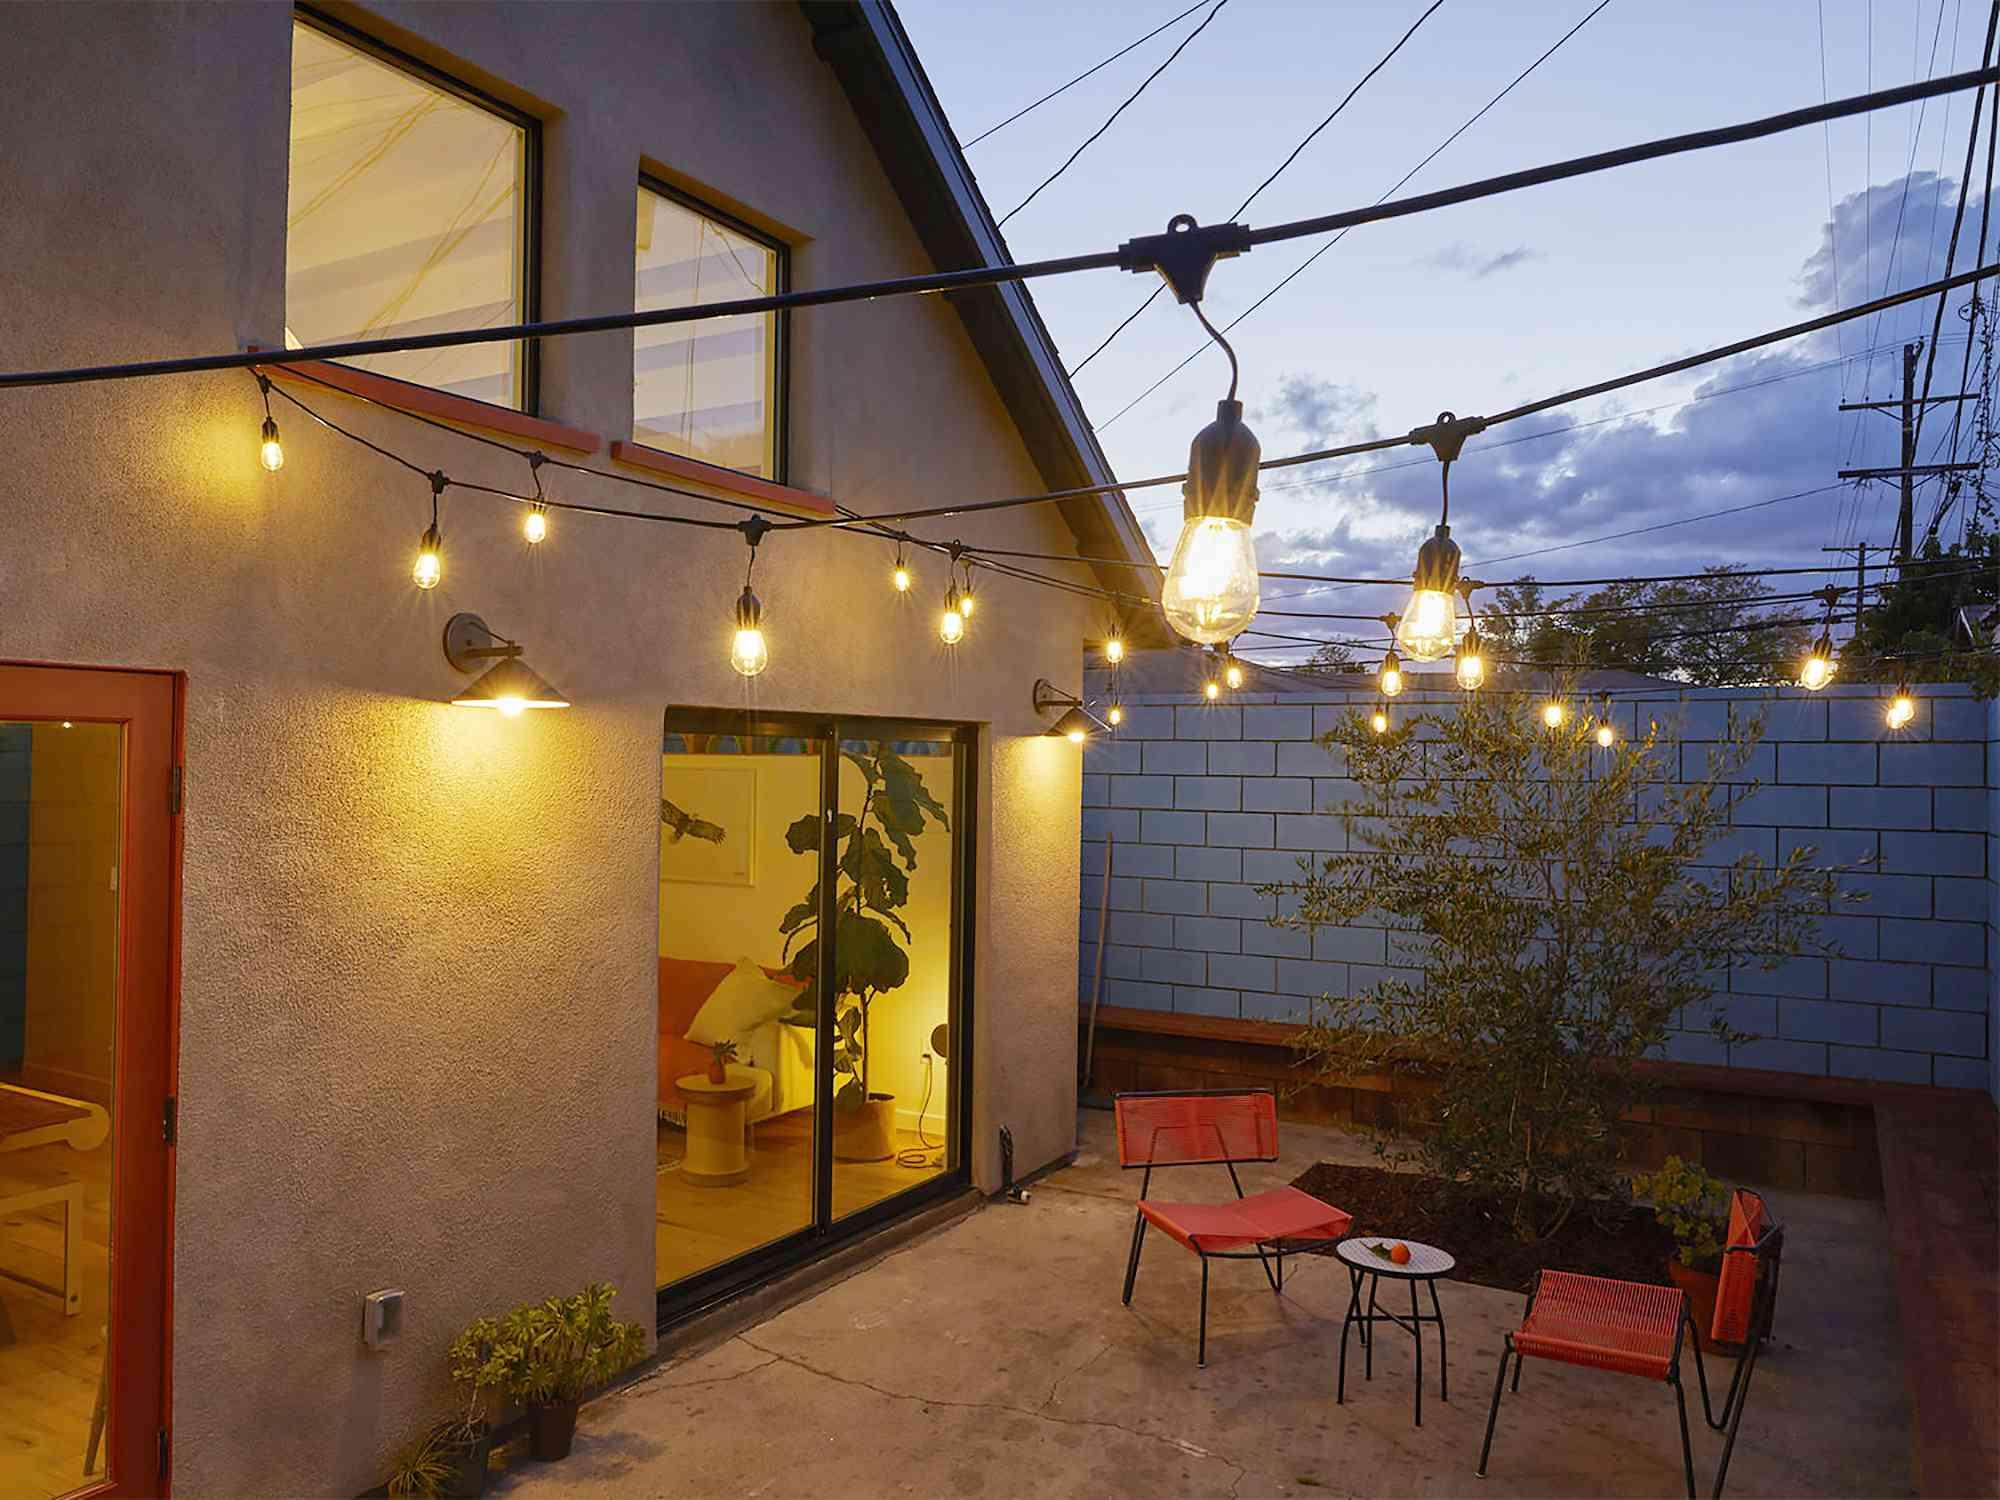 Highland Park ADU by Bunch Design back patio